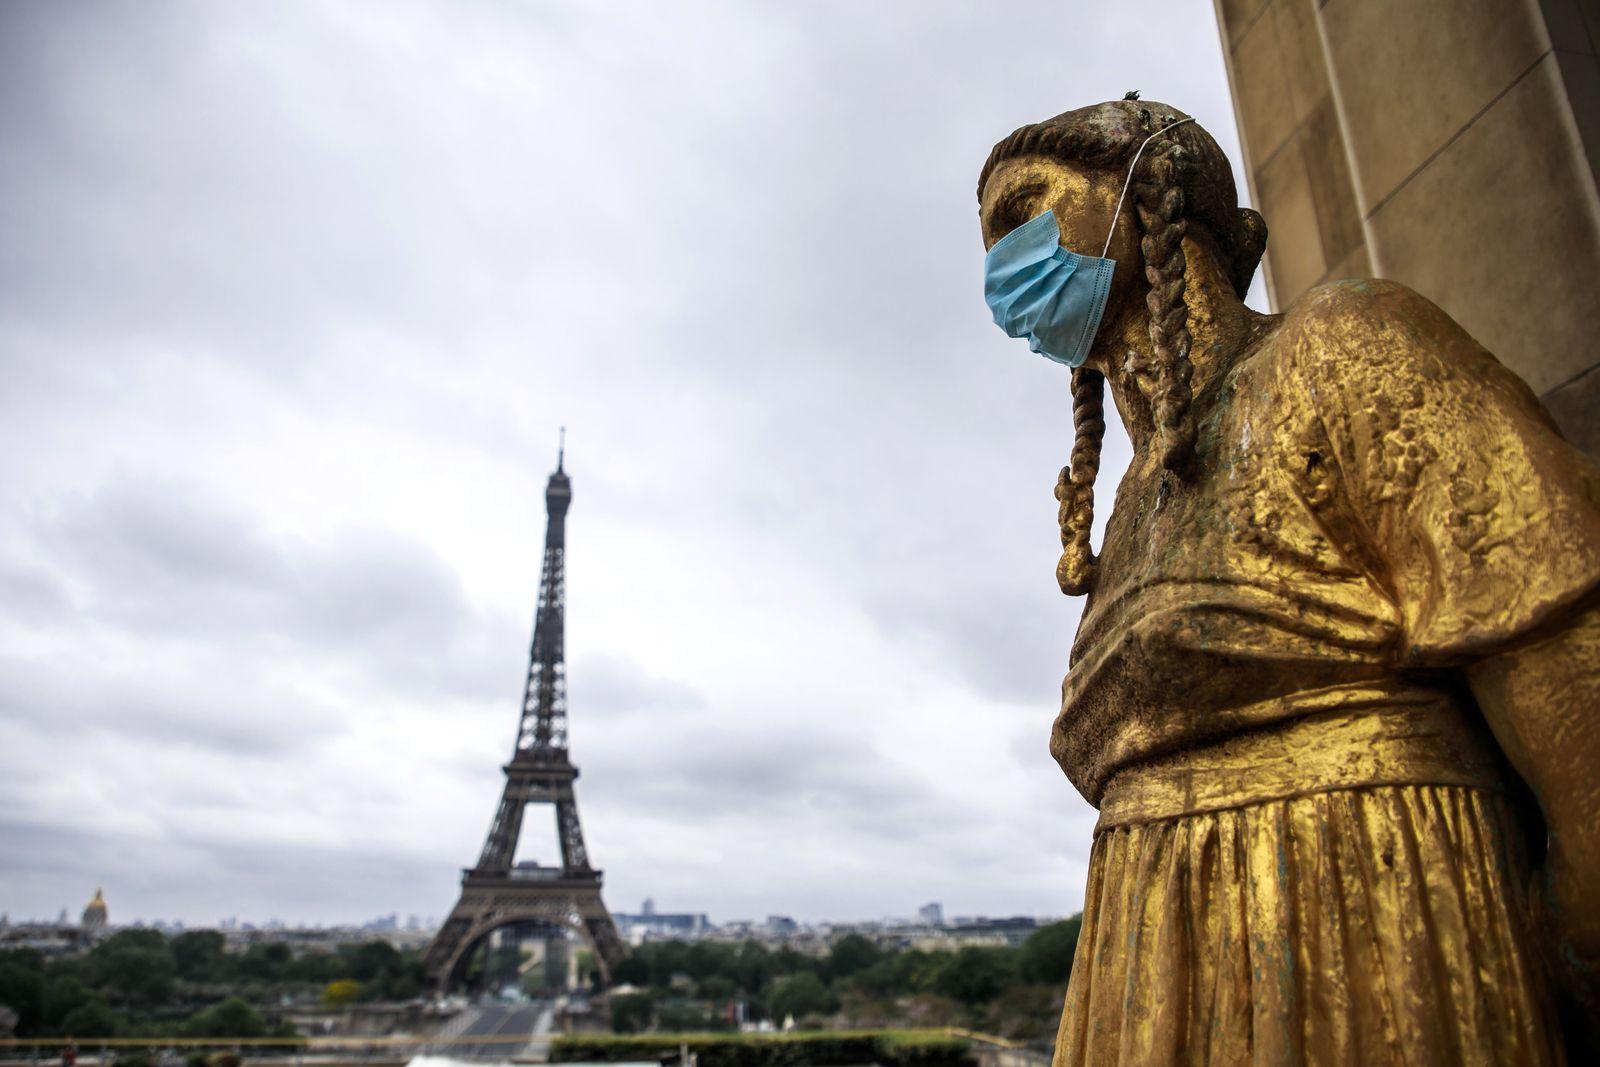 Daily life amid coronavirus COVID-19 pandemic in Paris, France - 03 May 2020